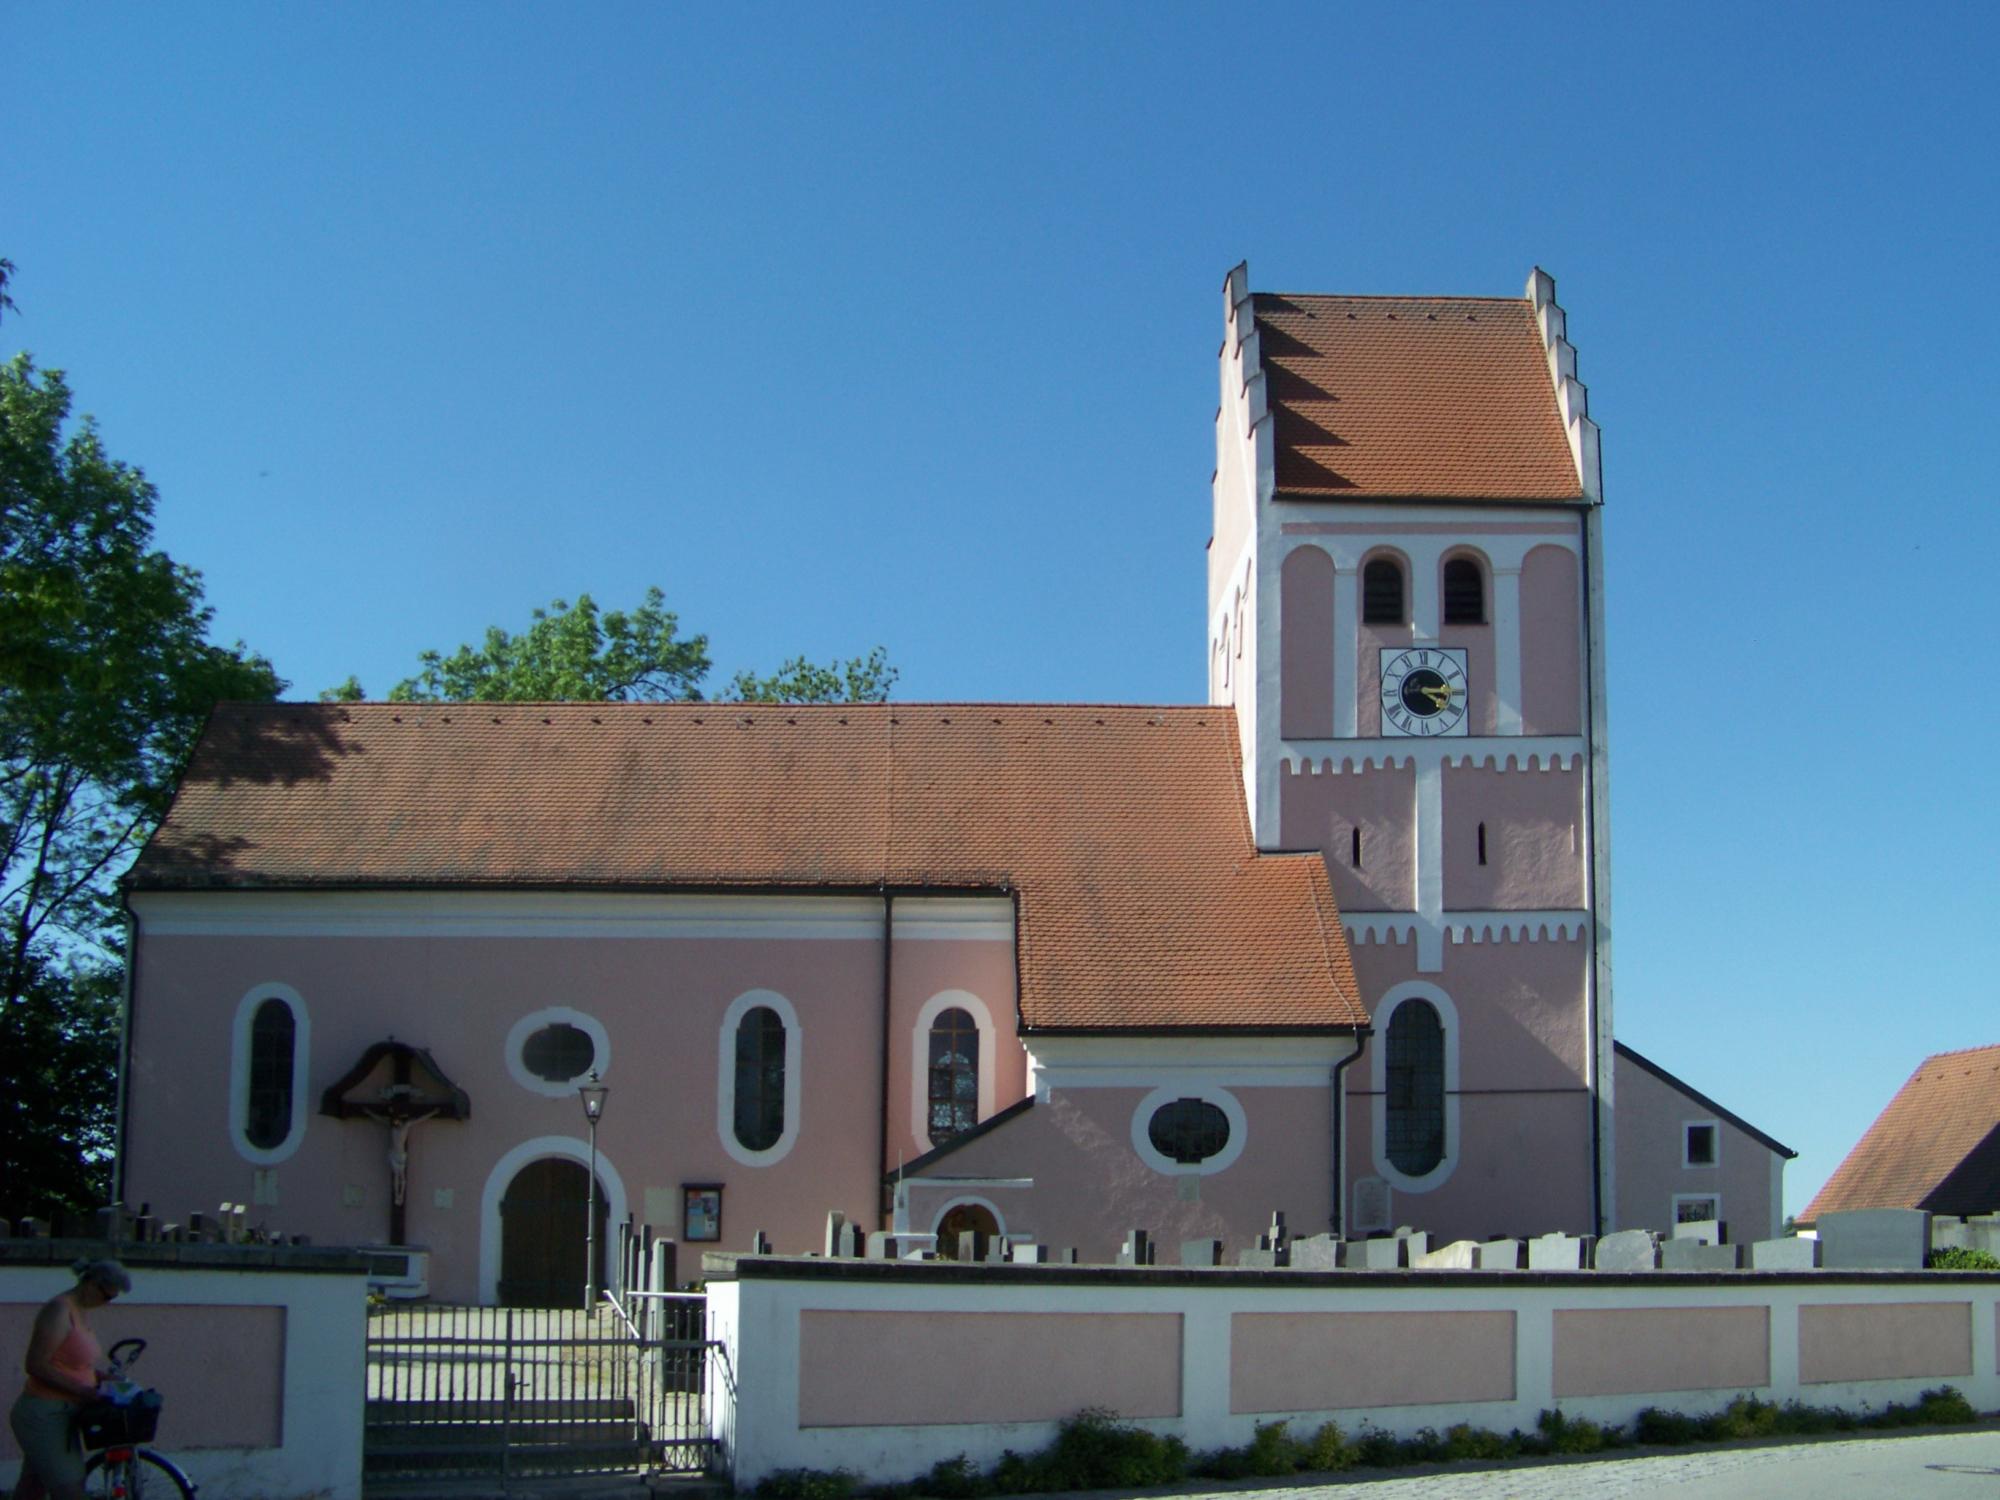 Niederp C3 B6ring 25 Pfarrkirche Sankt Bartholom C3 A4us